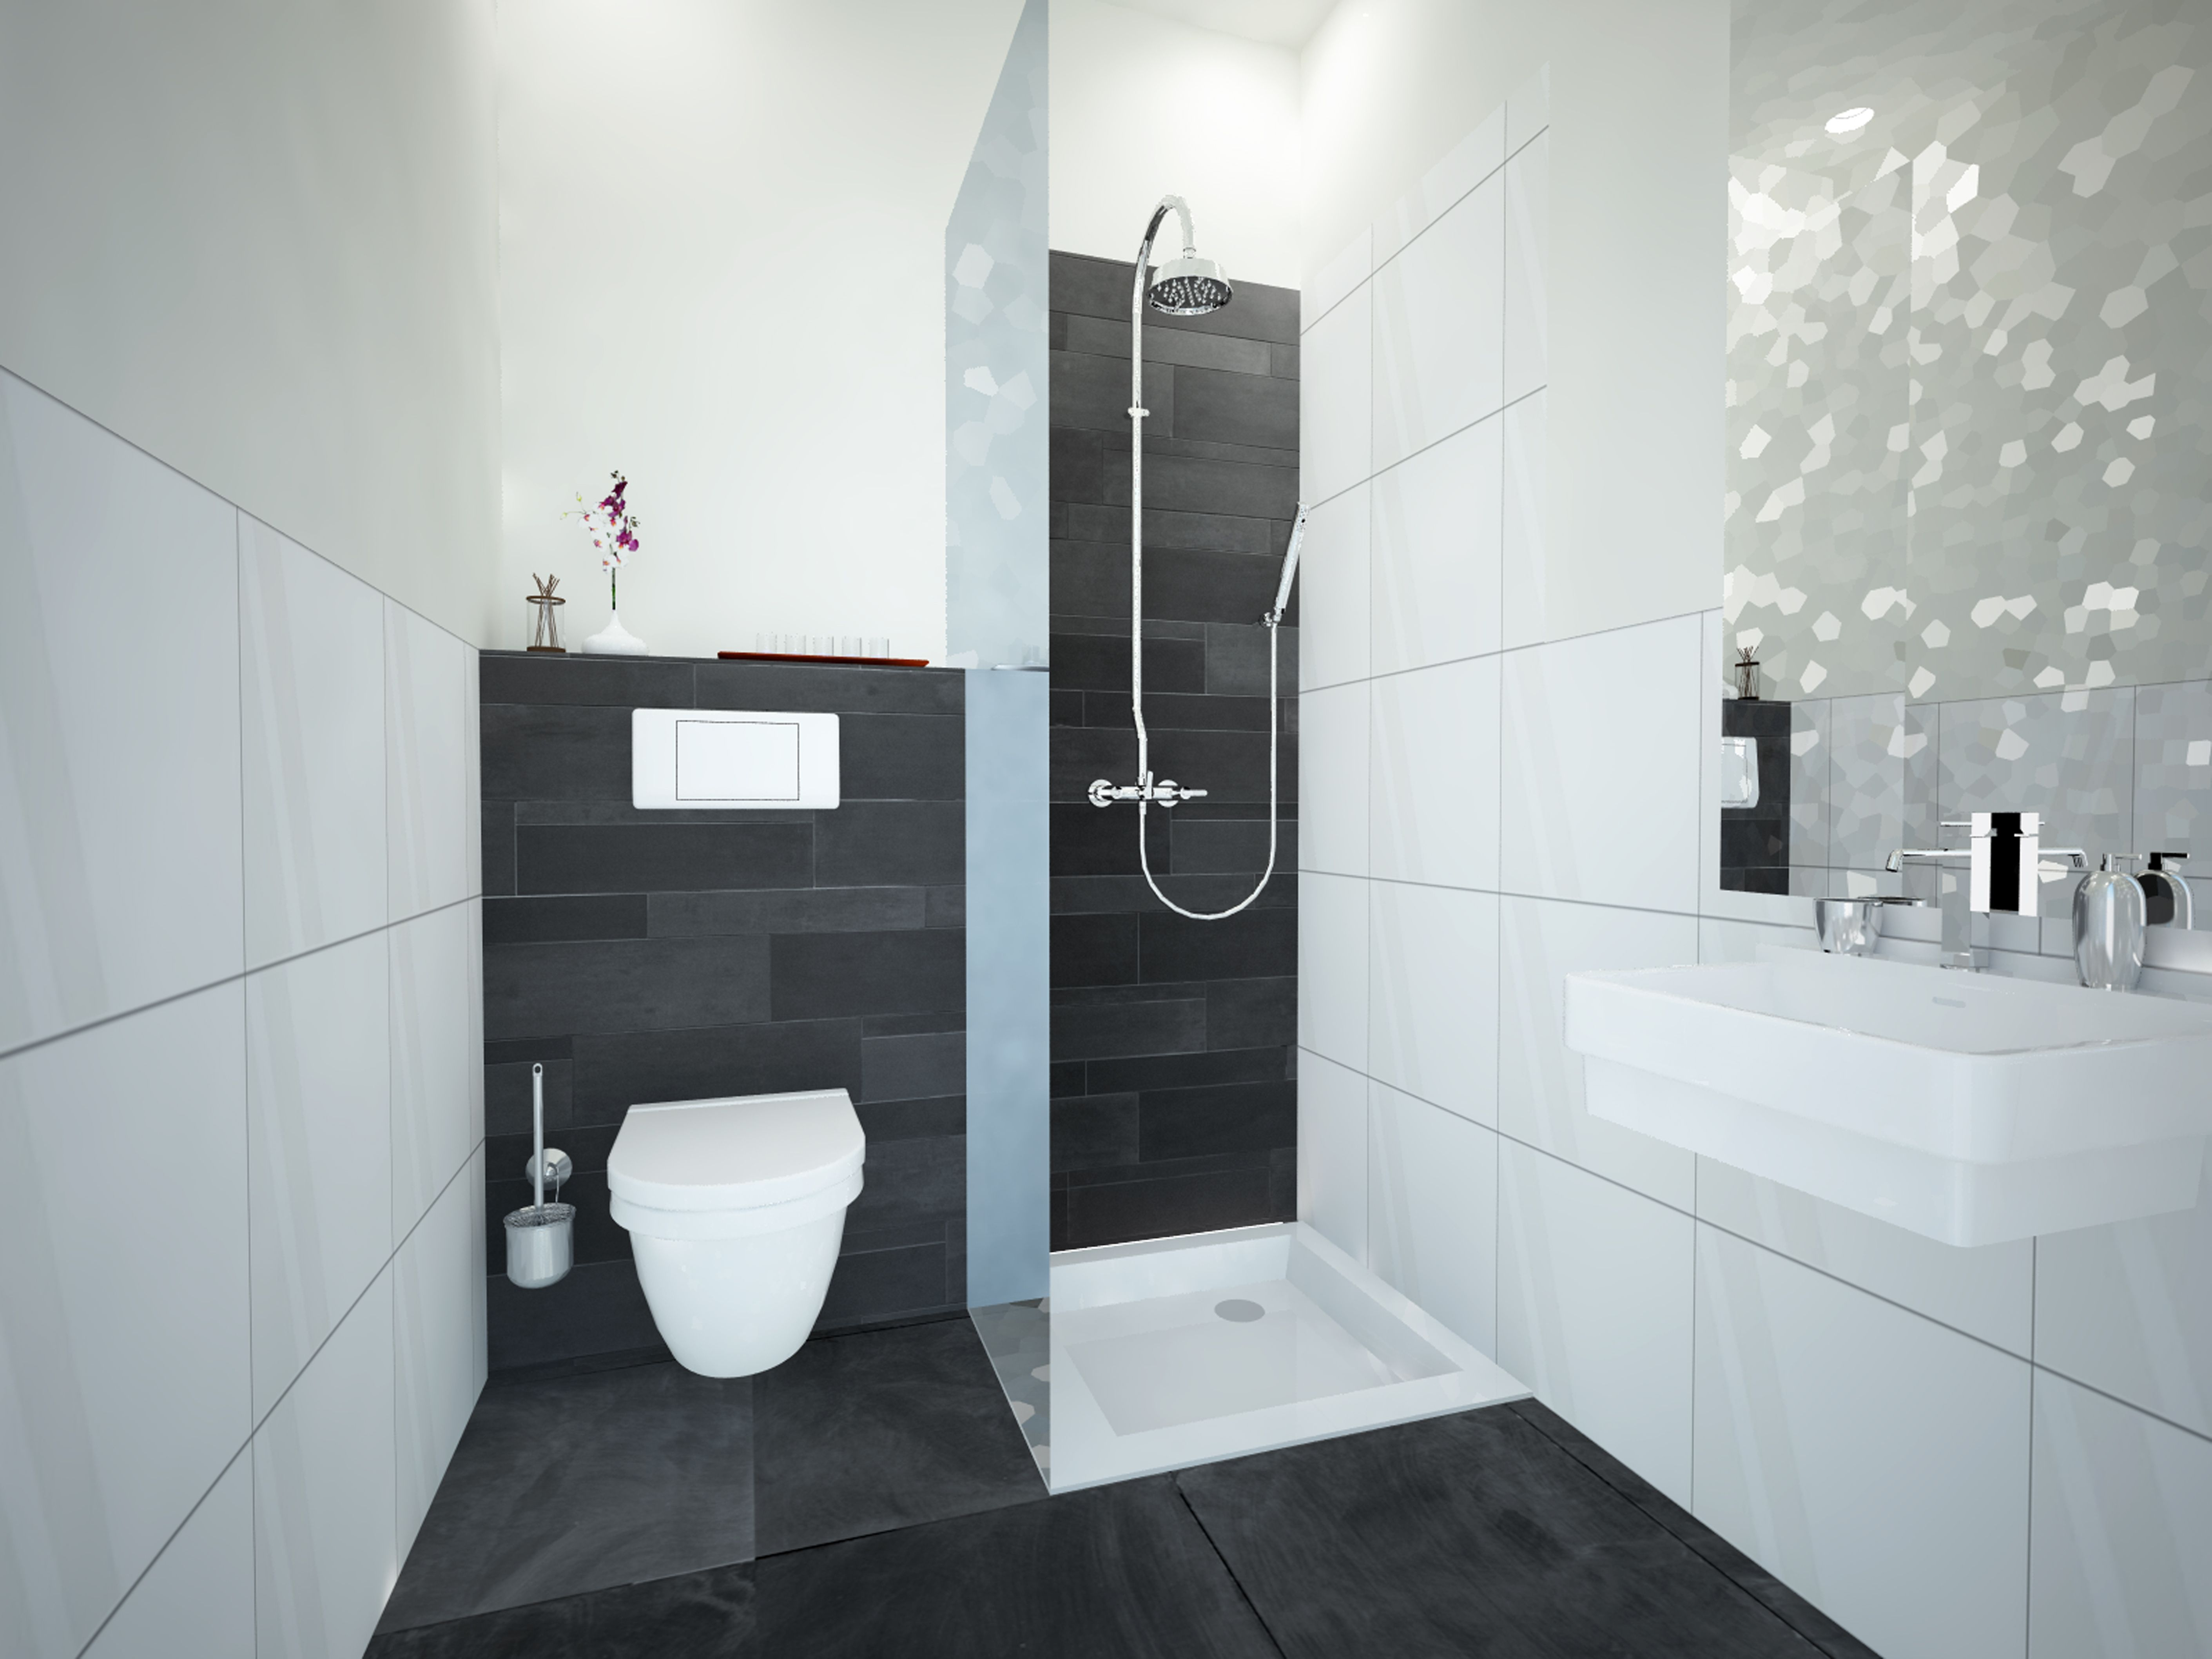 Badkamertegels Zwart Wit.Badkamer Zwart Wit In 2019 Badkamer Chique Badkamers En